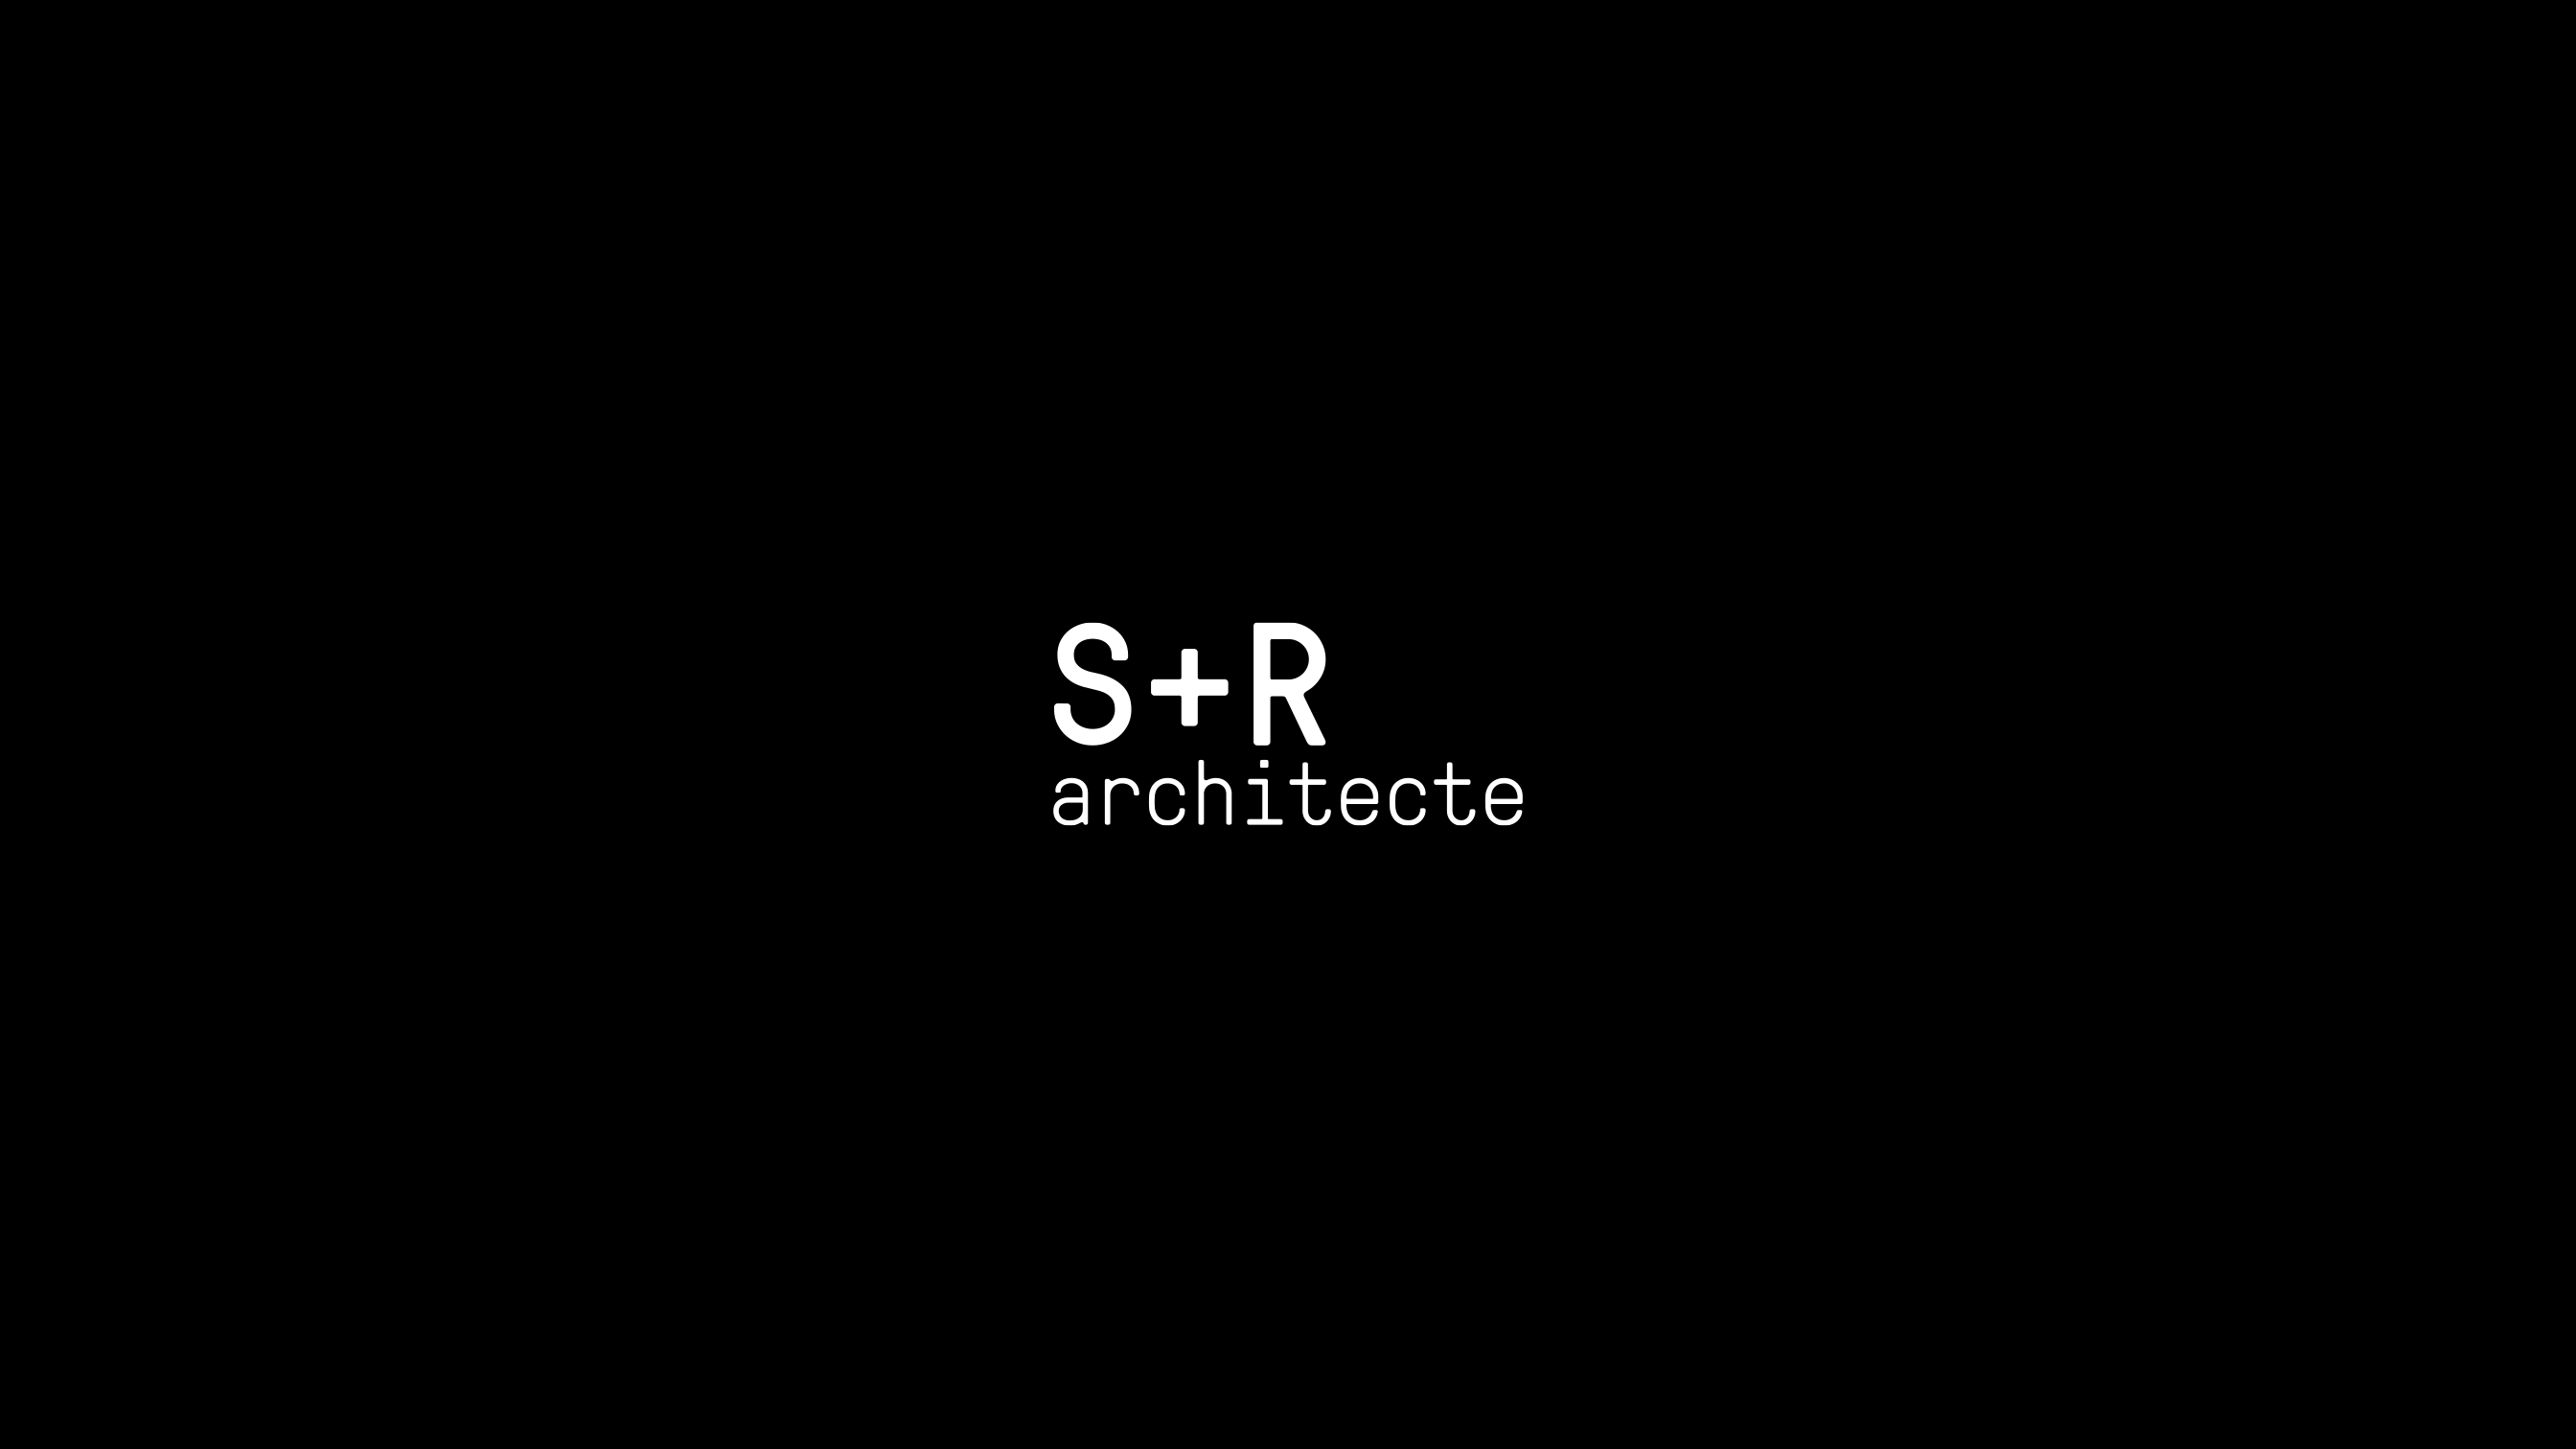 01-sr-architecte-logo-pikteo-webdesign-graphic-design-freelance-paris-bruxelles-londres